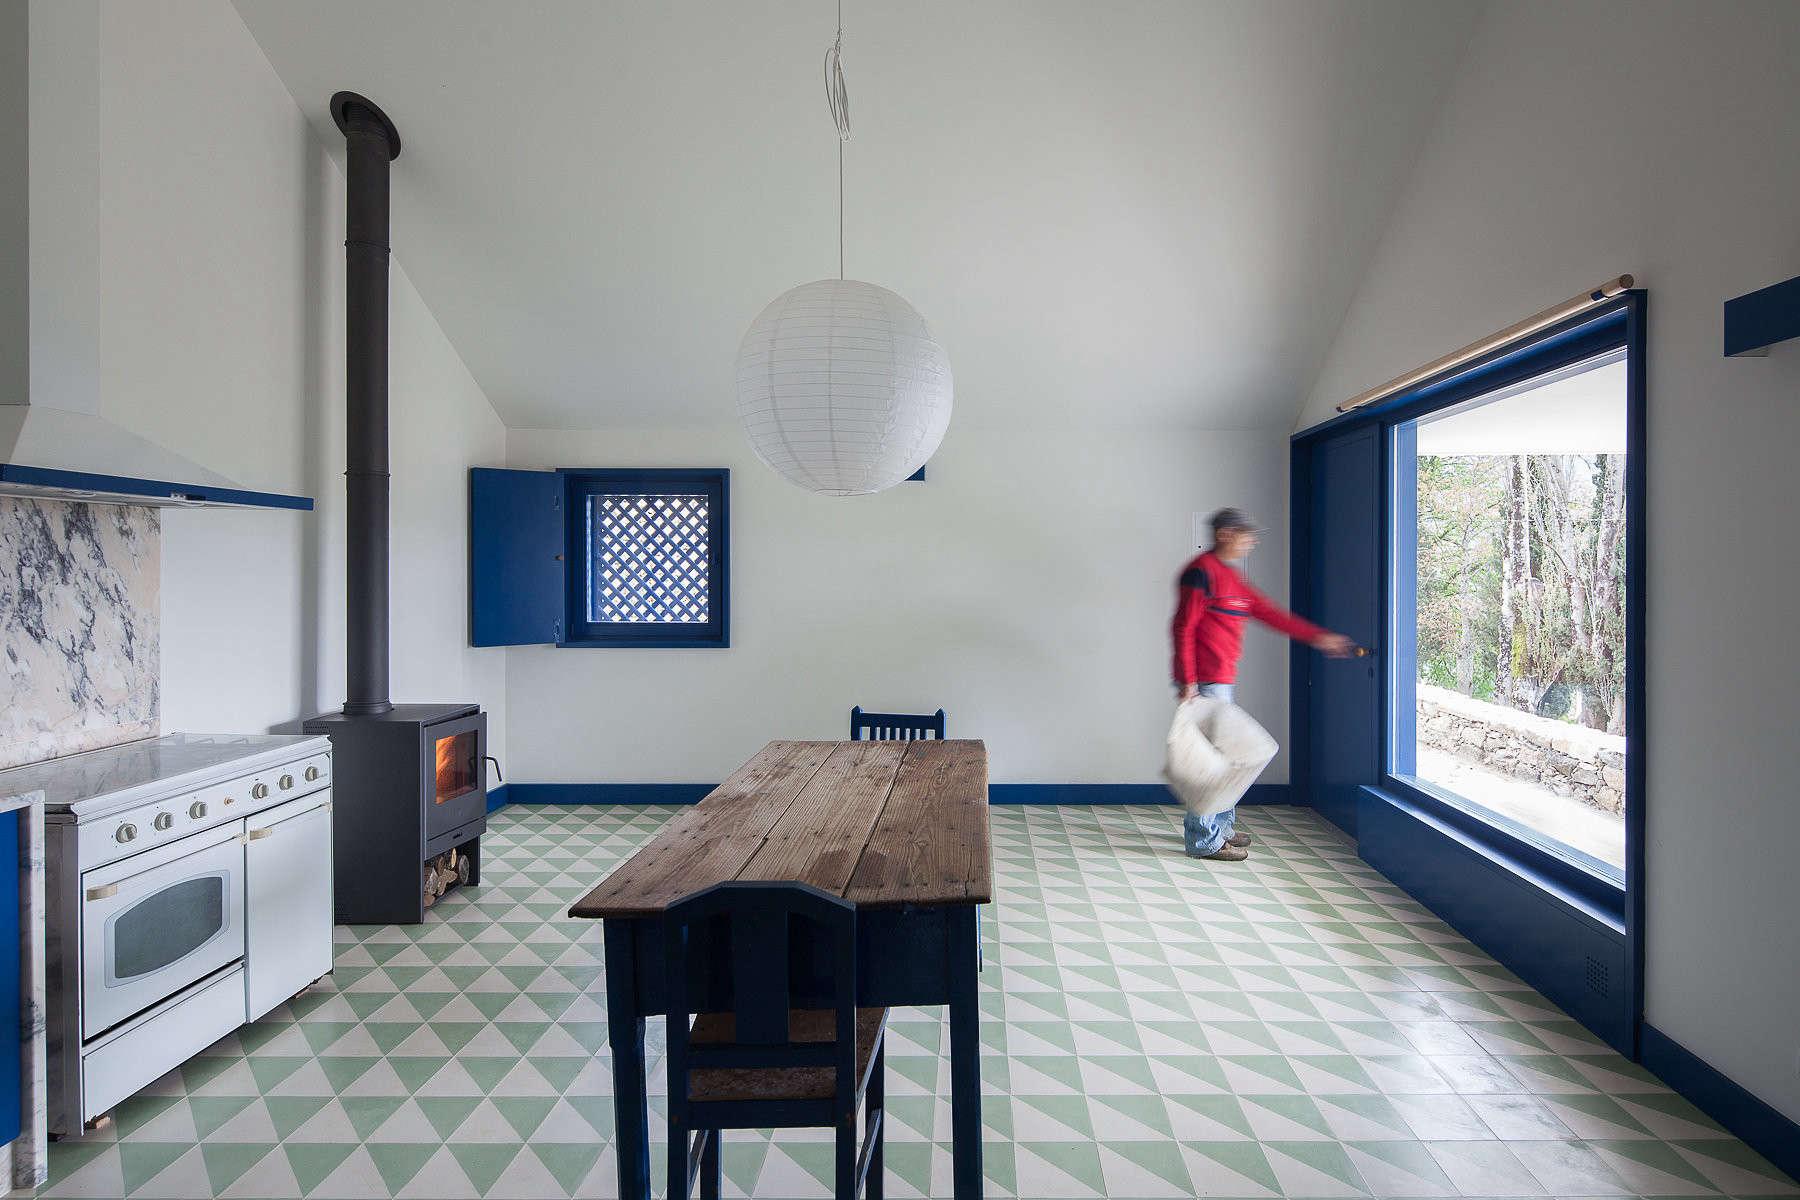 cabinets, windows, doors, and trim are all painteda vibrantblue. 11